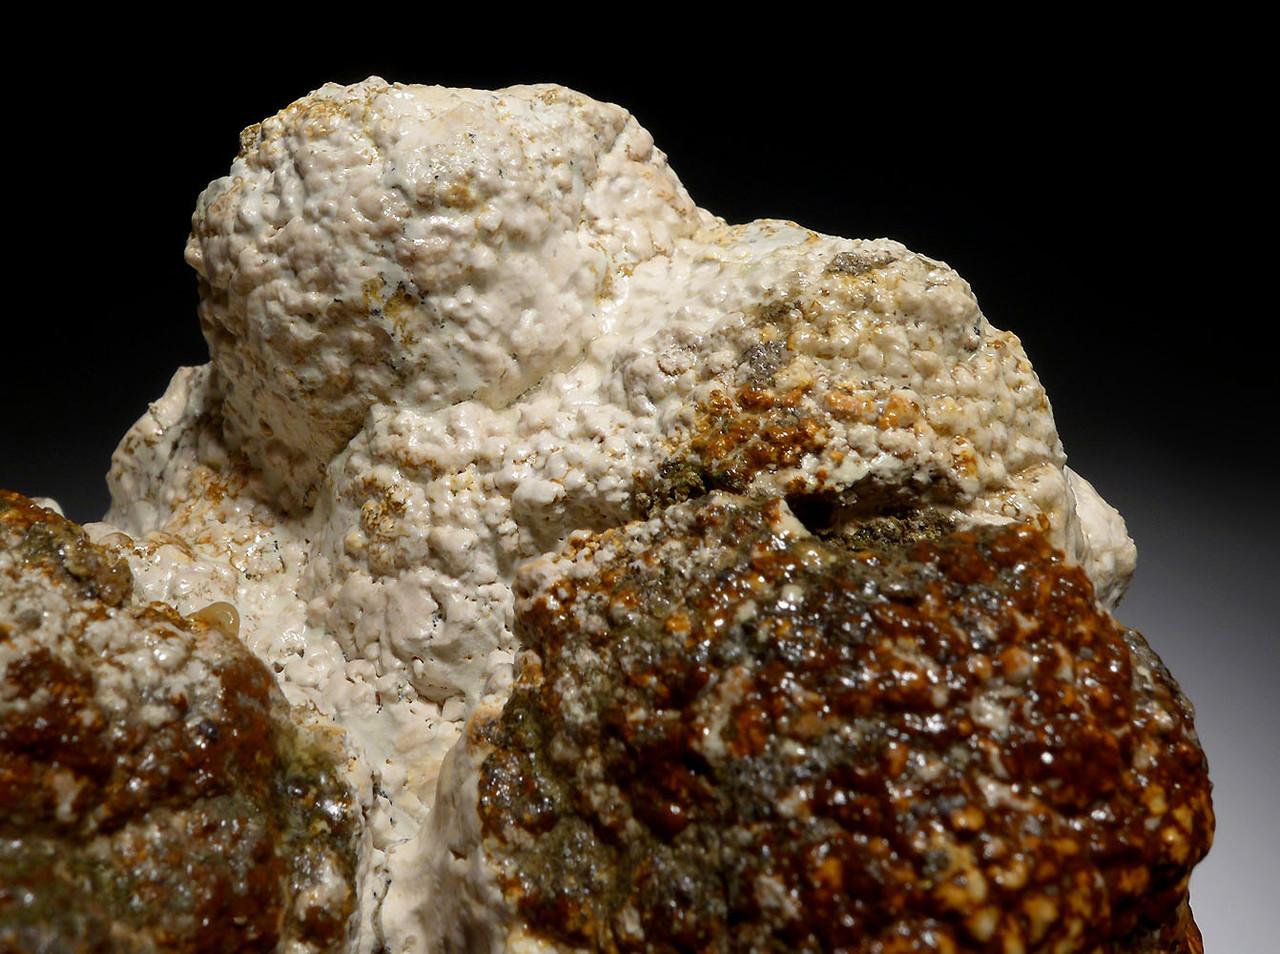 NATURAL FOSSIL STROMATOLITE CYANOBACTERIA COLONY FROM AN ANCIENT OLIGOCENE LAKE  *ST020